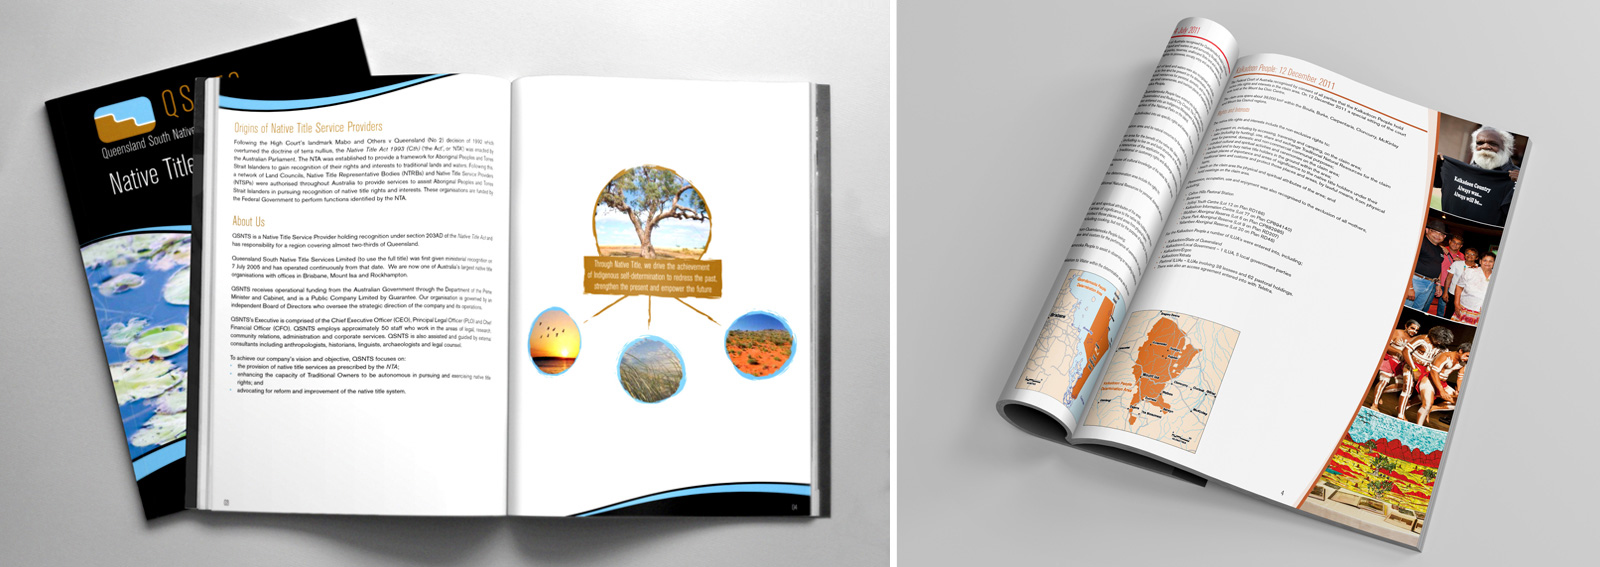 QSNTS Native Title Booklet & QSNTS PBC Summit Booklet